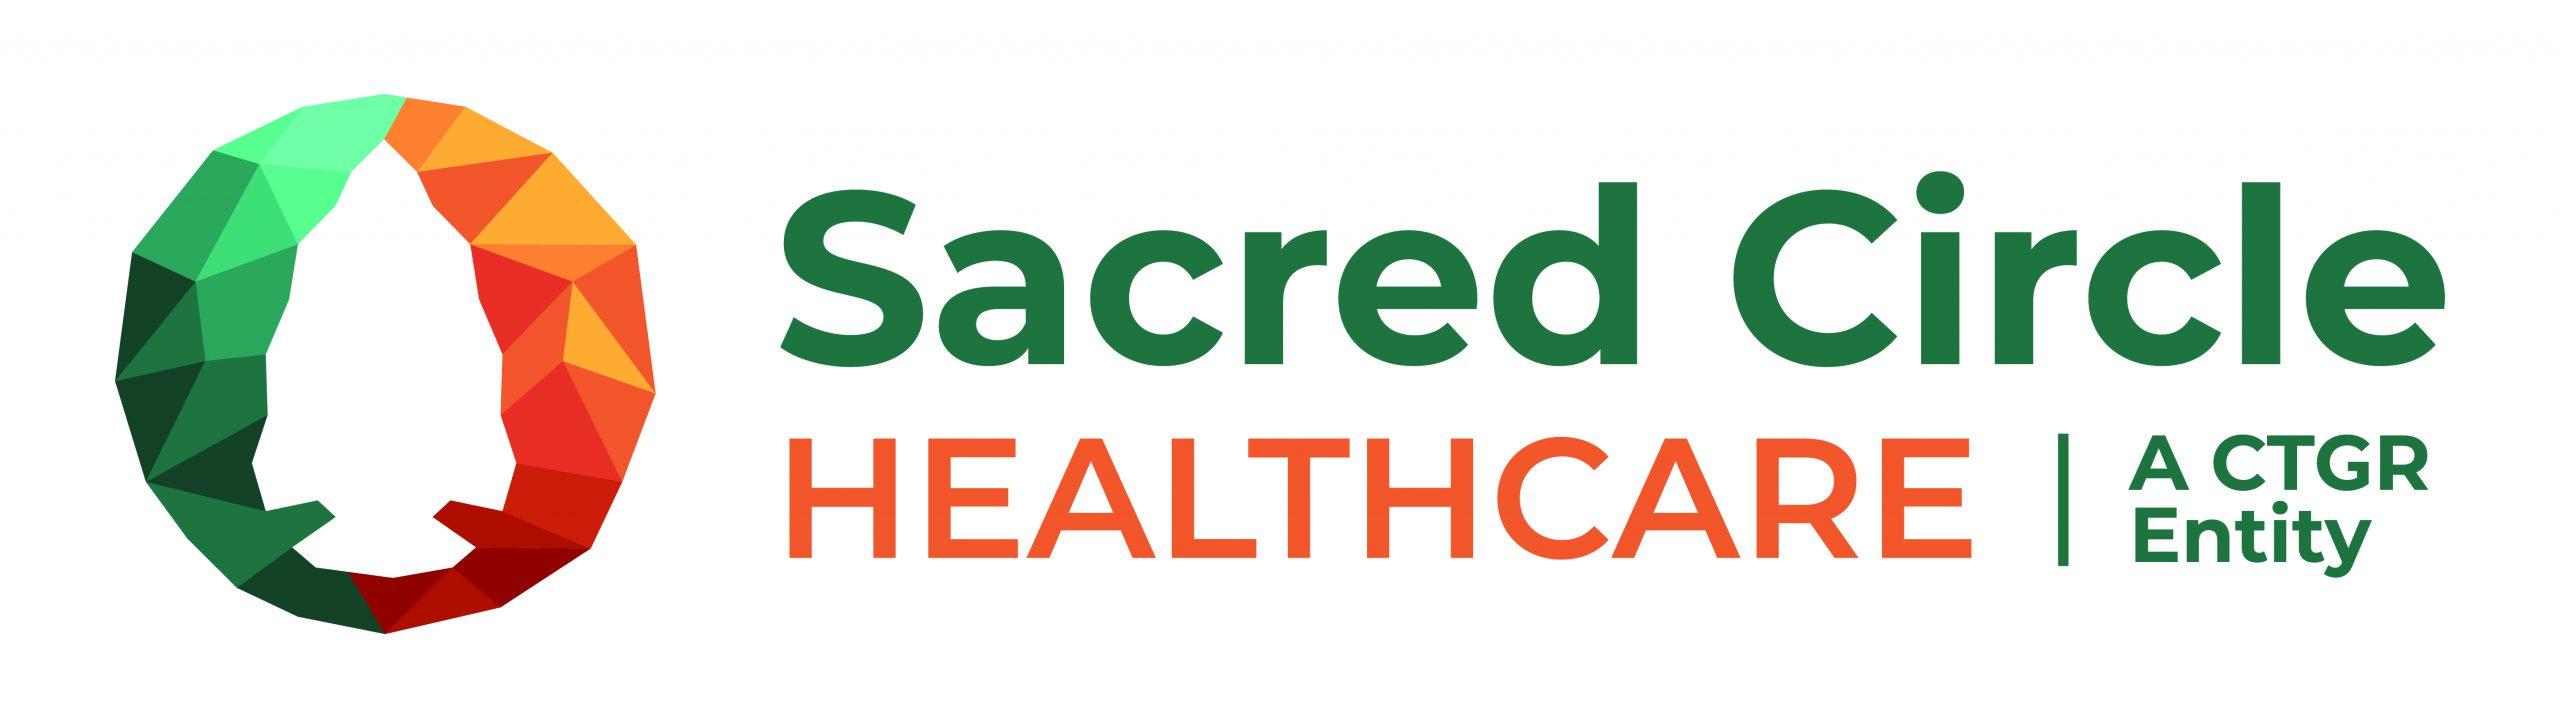 Sacred Circle Healthcare